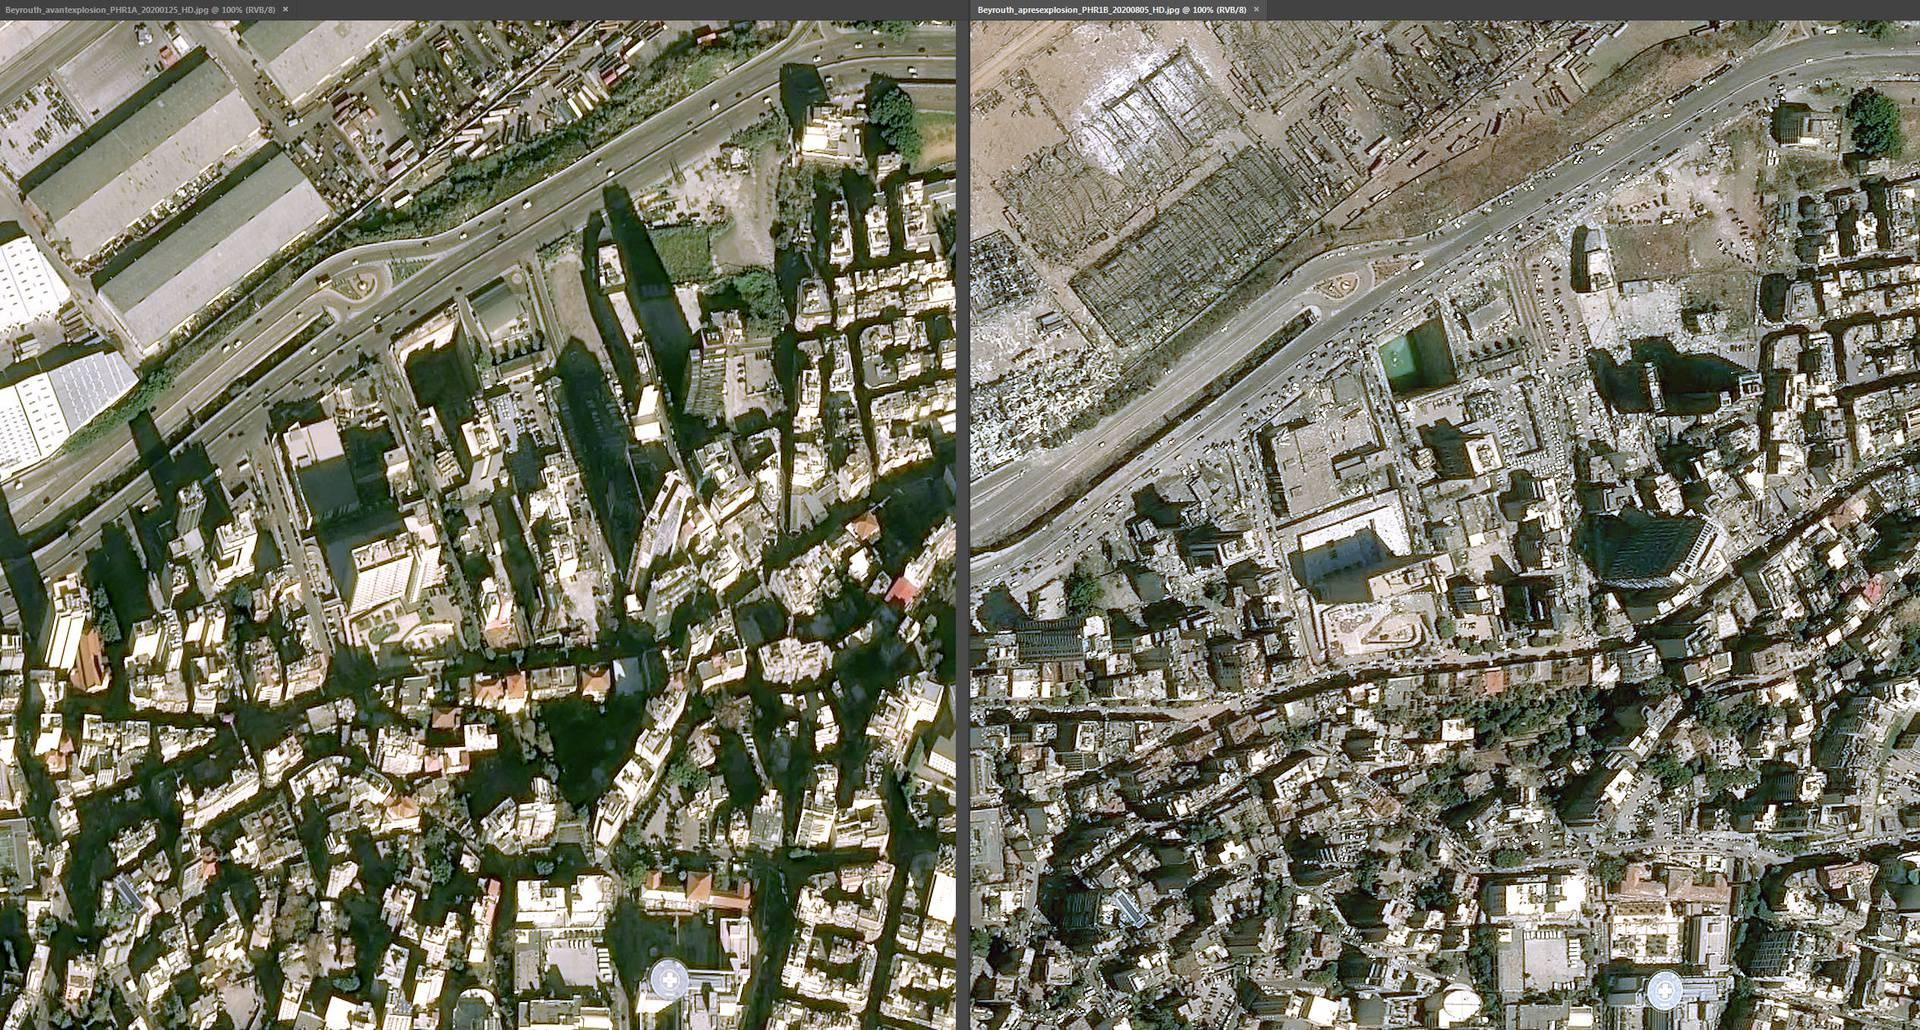 Šokantne satelitske snimke Bejruta prije i poslije eksplozije